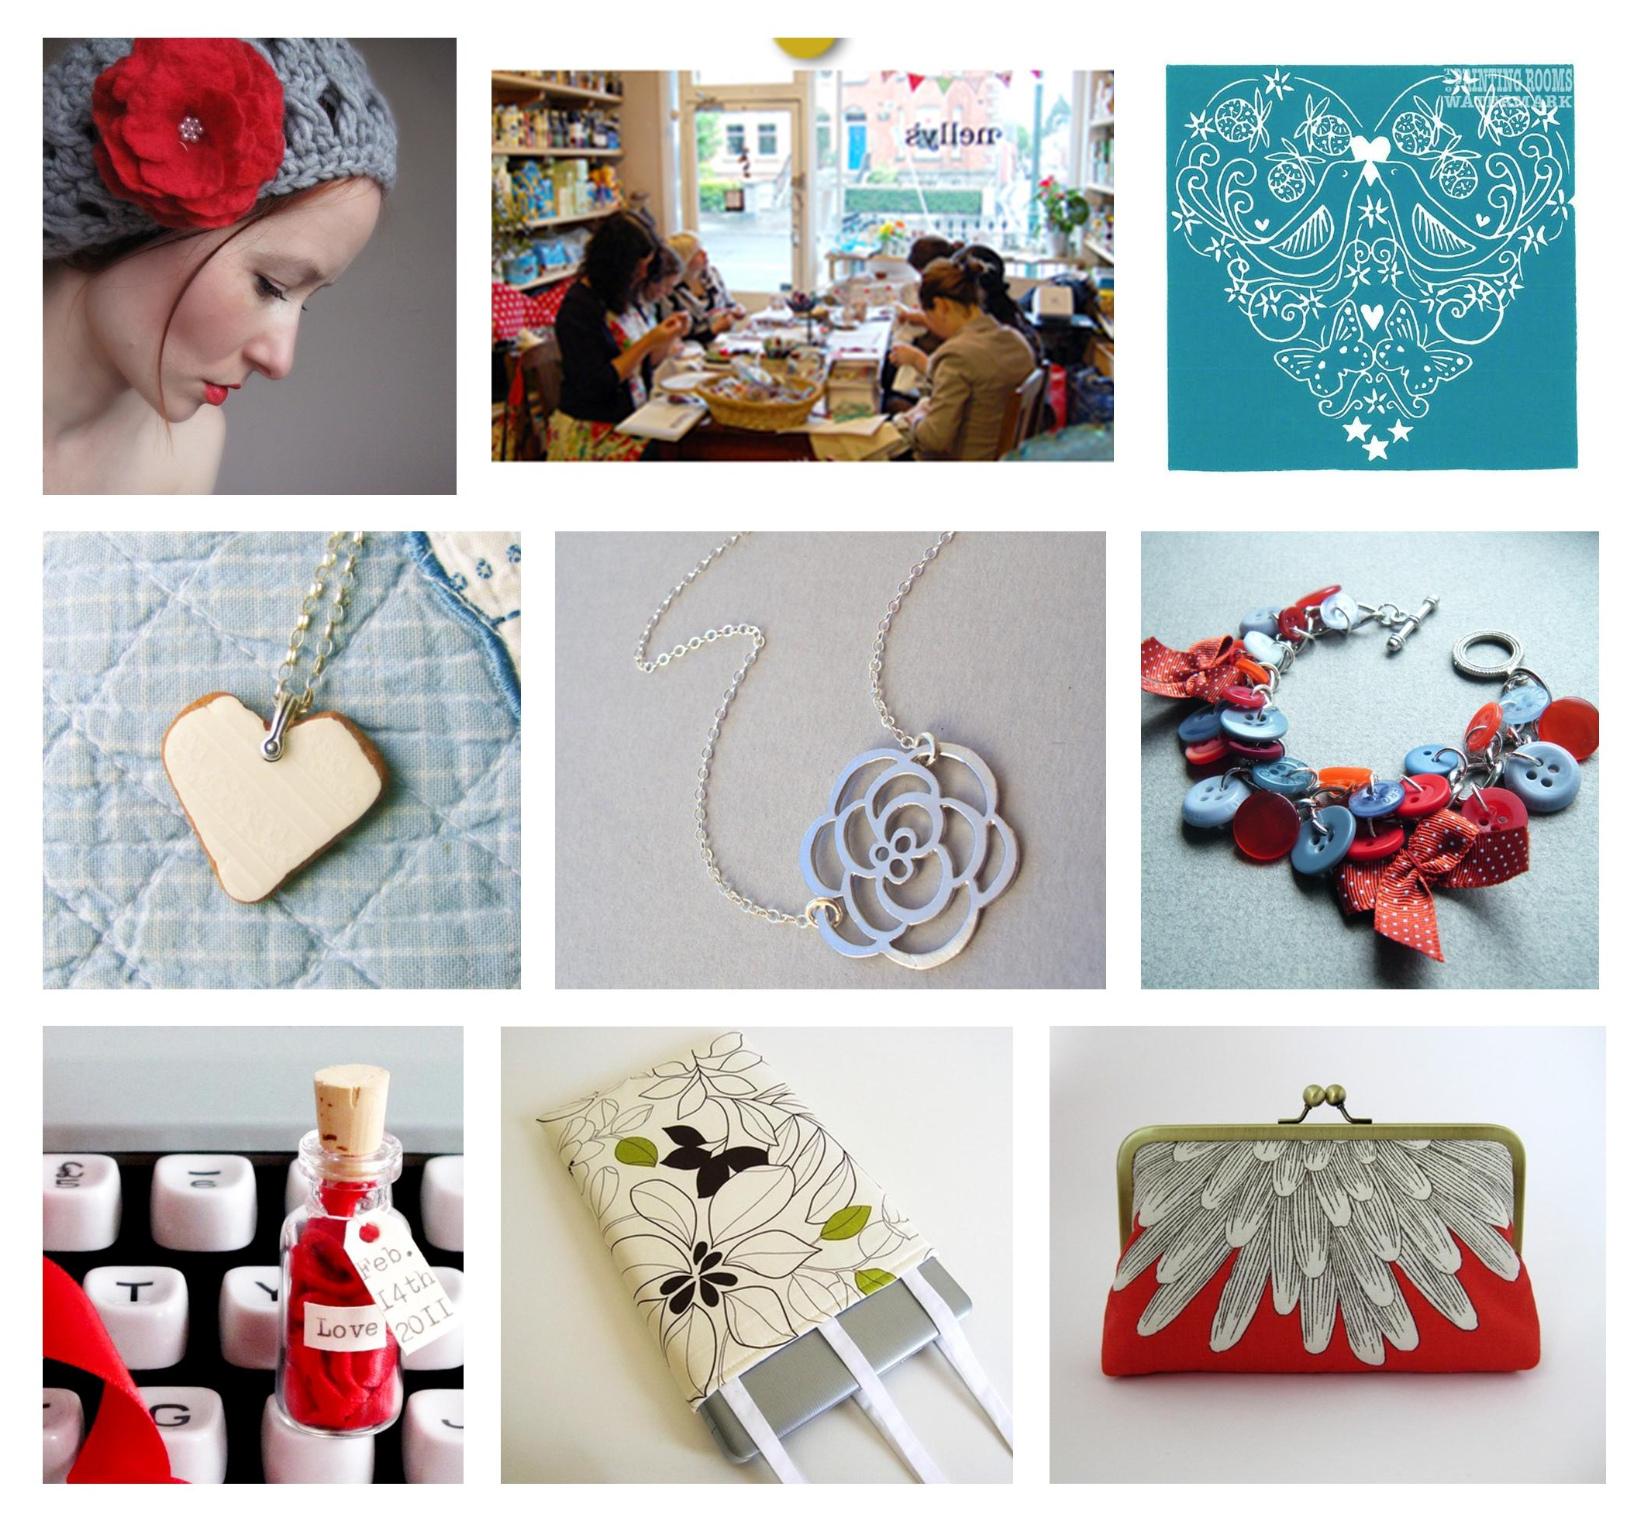 40th Birthday Presents For Her >> 40th Birthday Ideas Gift Ideas For 50th Birthday For Her